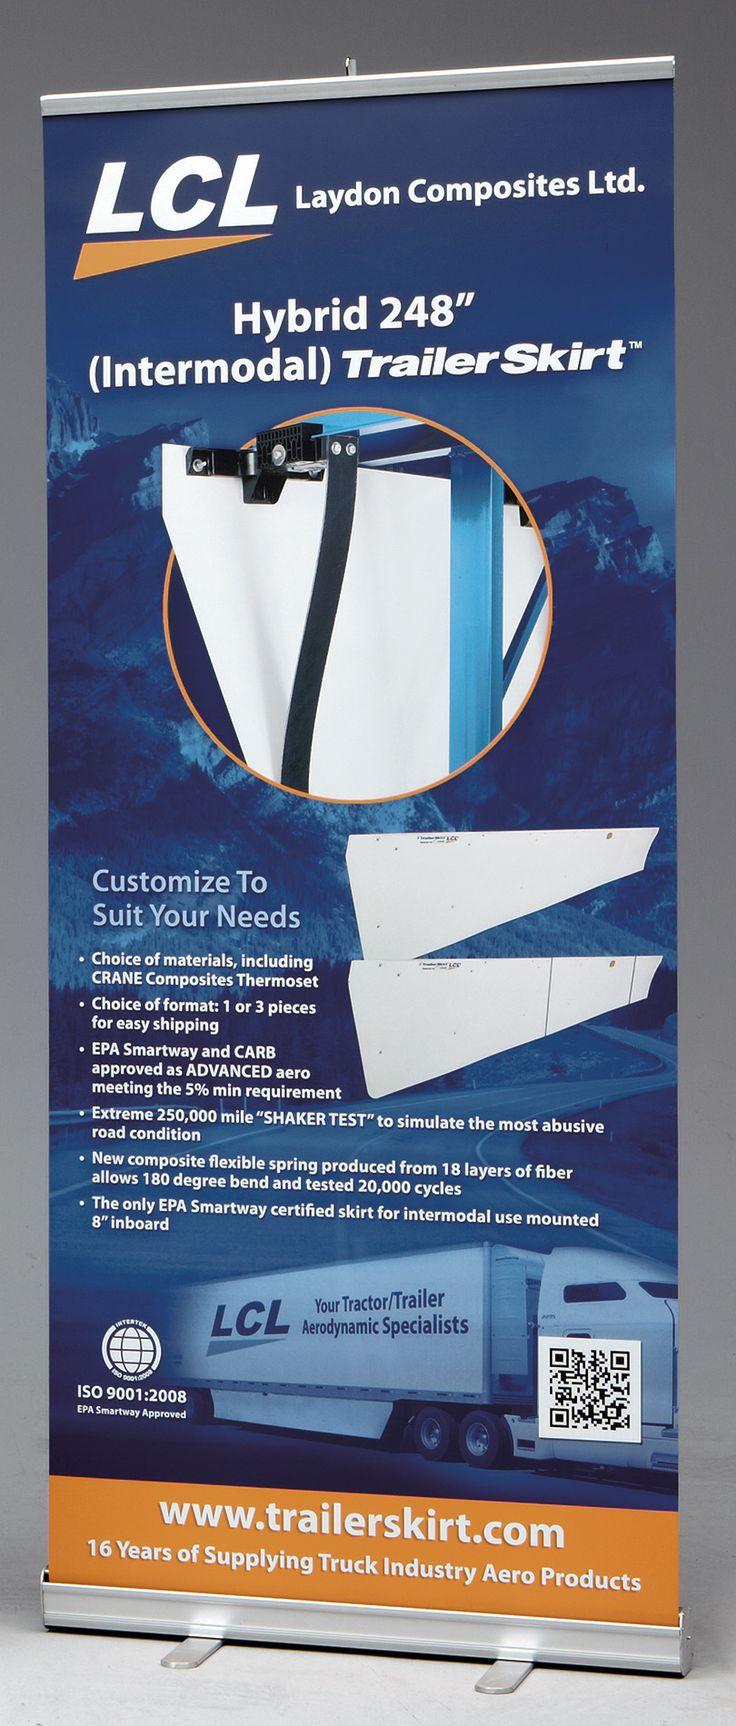 Retractable Banner Stand for Laydon Composite Ltd. (LCL) Hybrid Trailer Skirt [bcreative - Bochsler Creative Solutions]